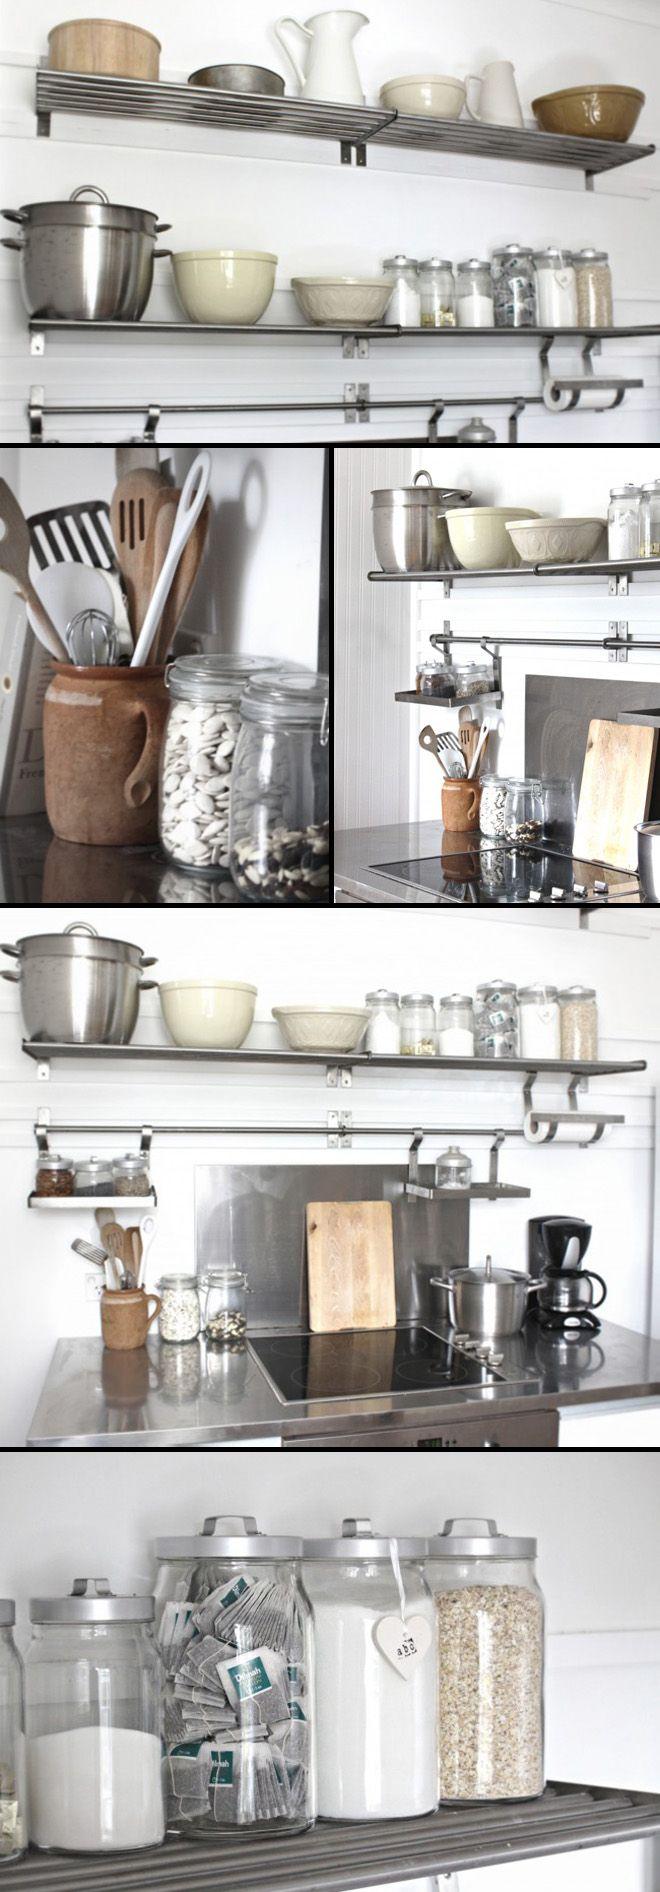 Kitchen Racks Stainless Steel 25 Best Ideas About Stainless Steel Kitchen Shelves On Pinterest